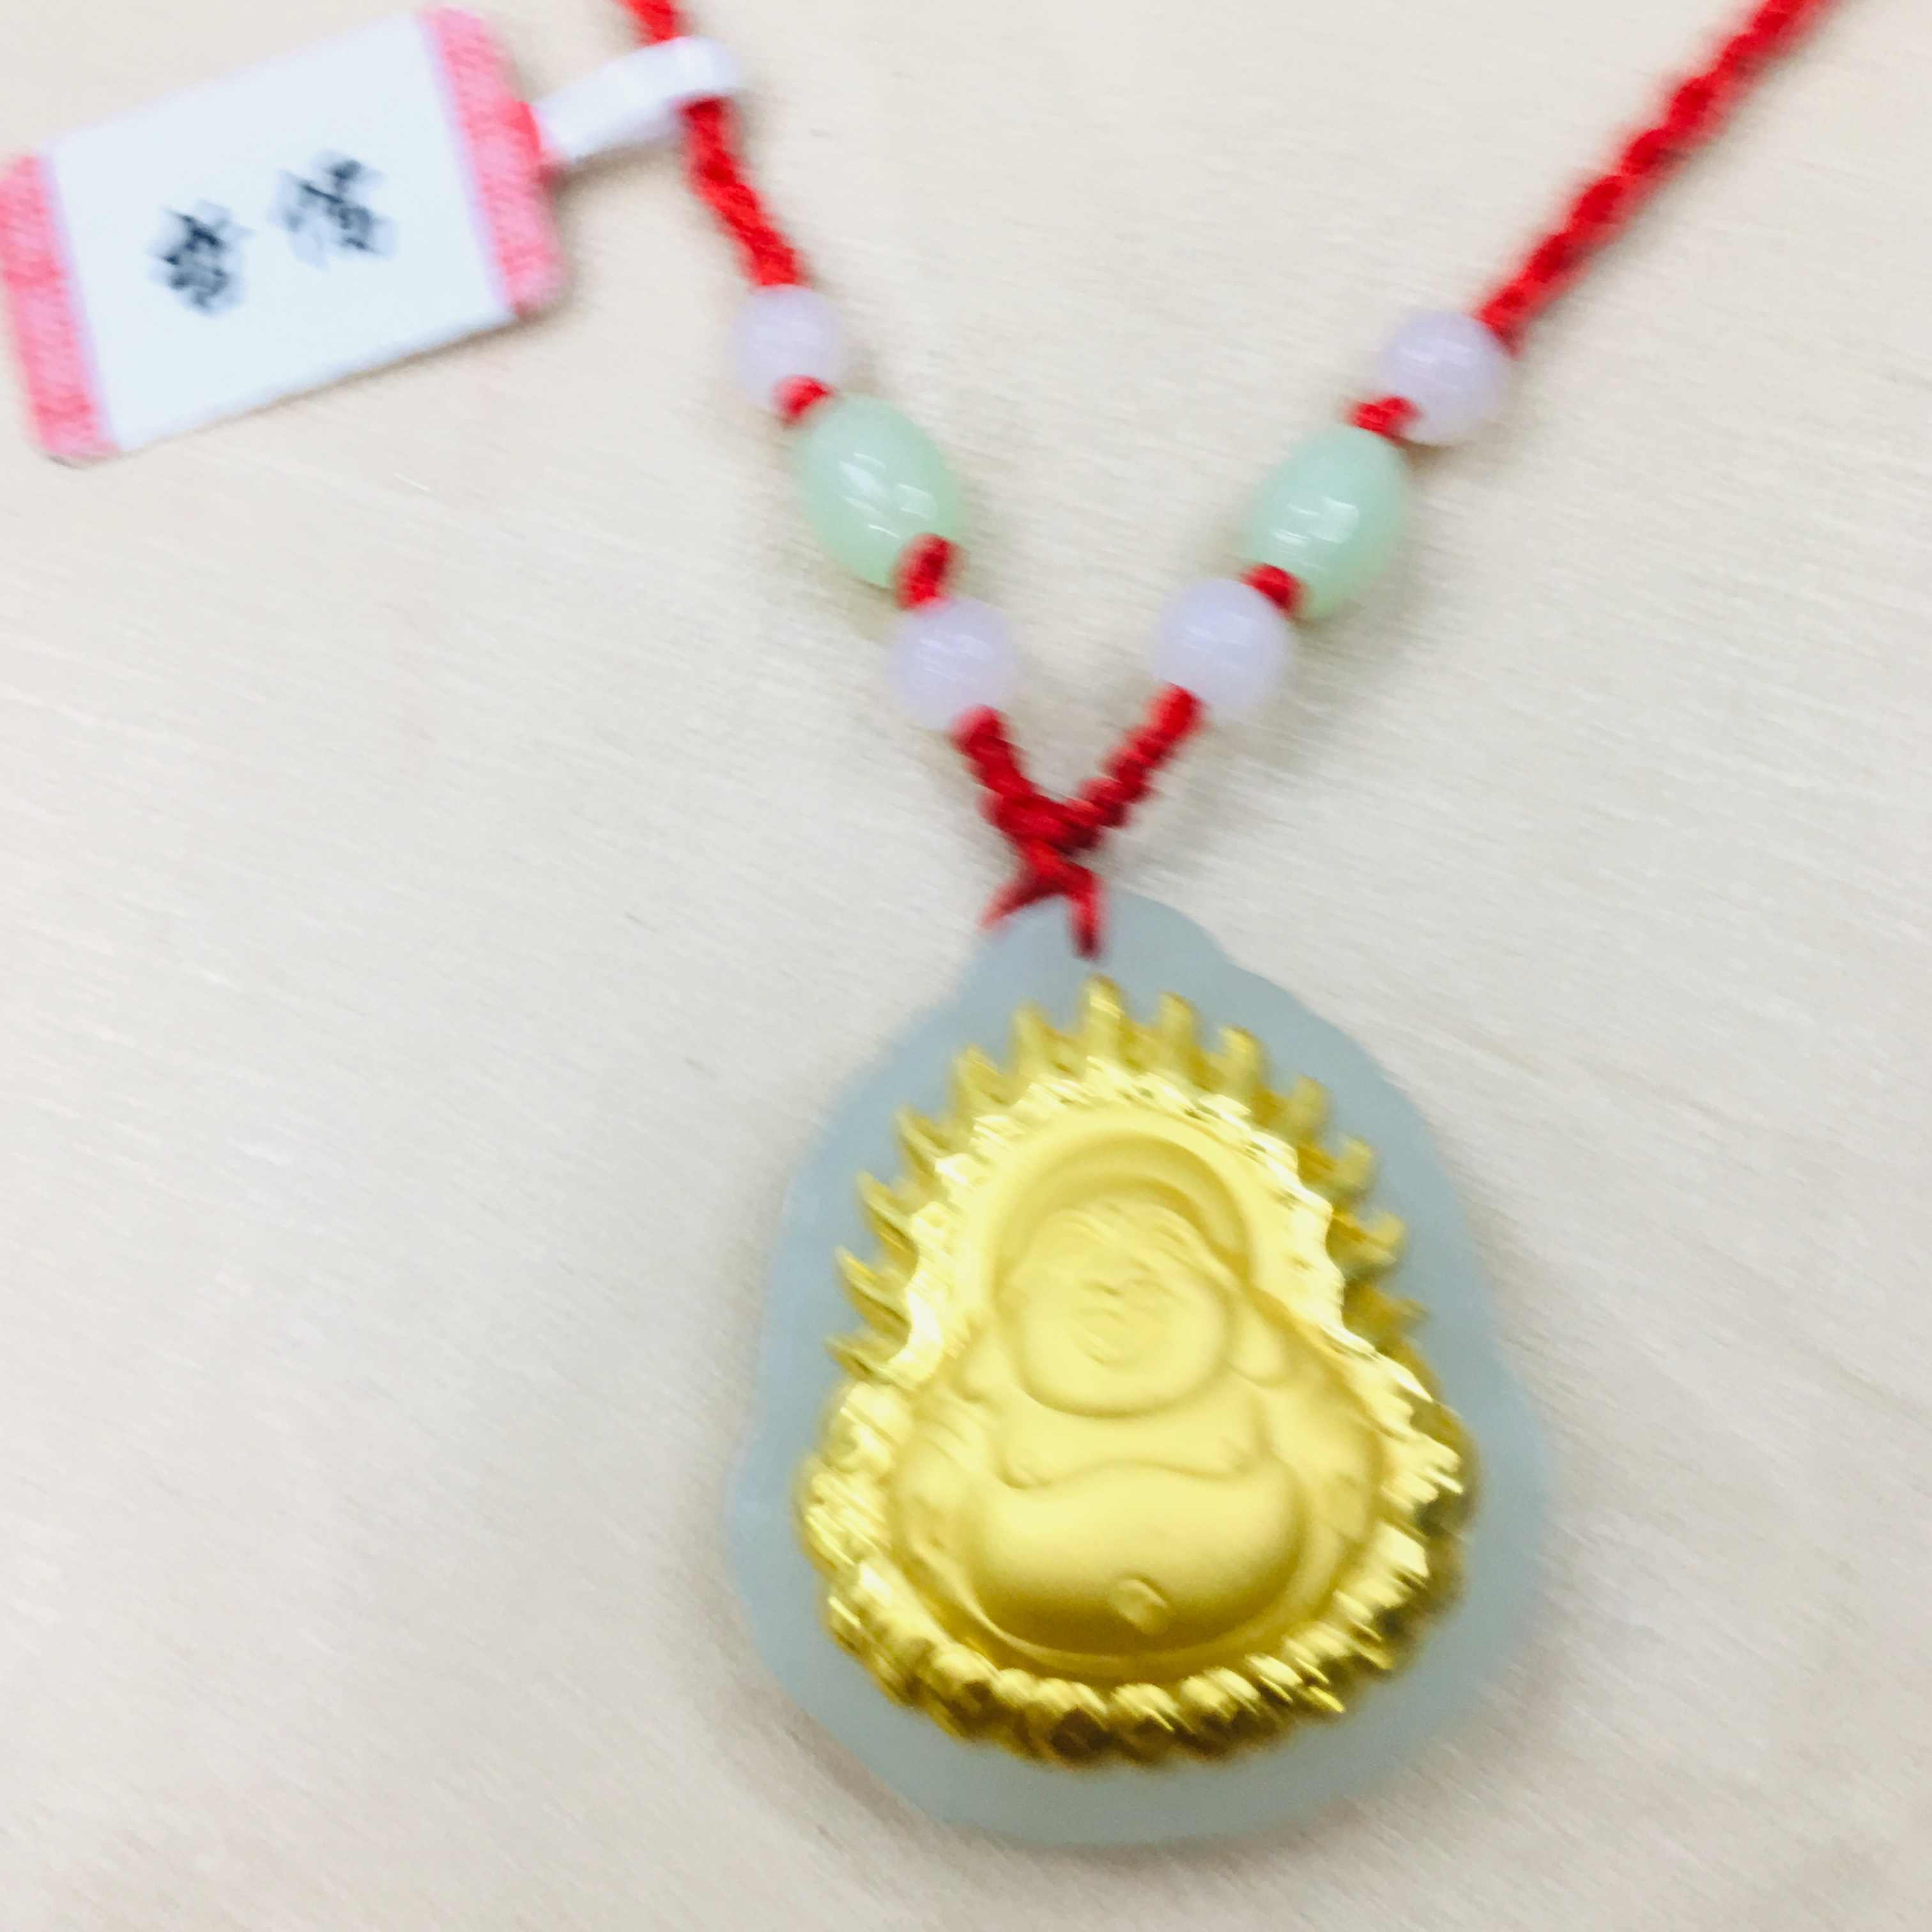 Zheru เครื่องประดับธรรมชาติสีดำ Hetian หยกหยก 24k gold หัวเราะพระพุทธรูป Guanyin จี้สร้อยคอหยกหยกทองส่ง cert